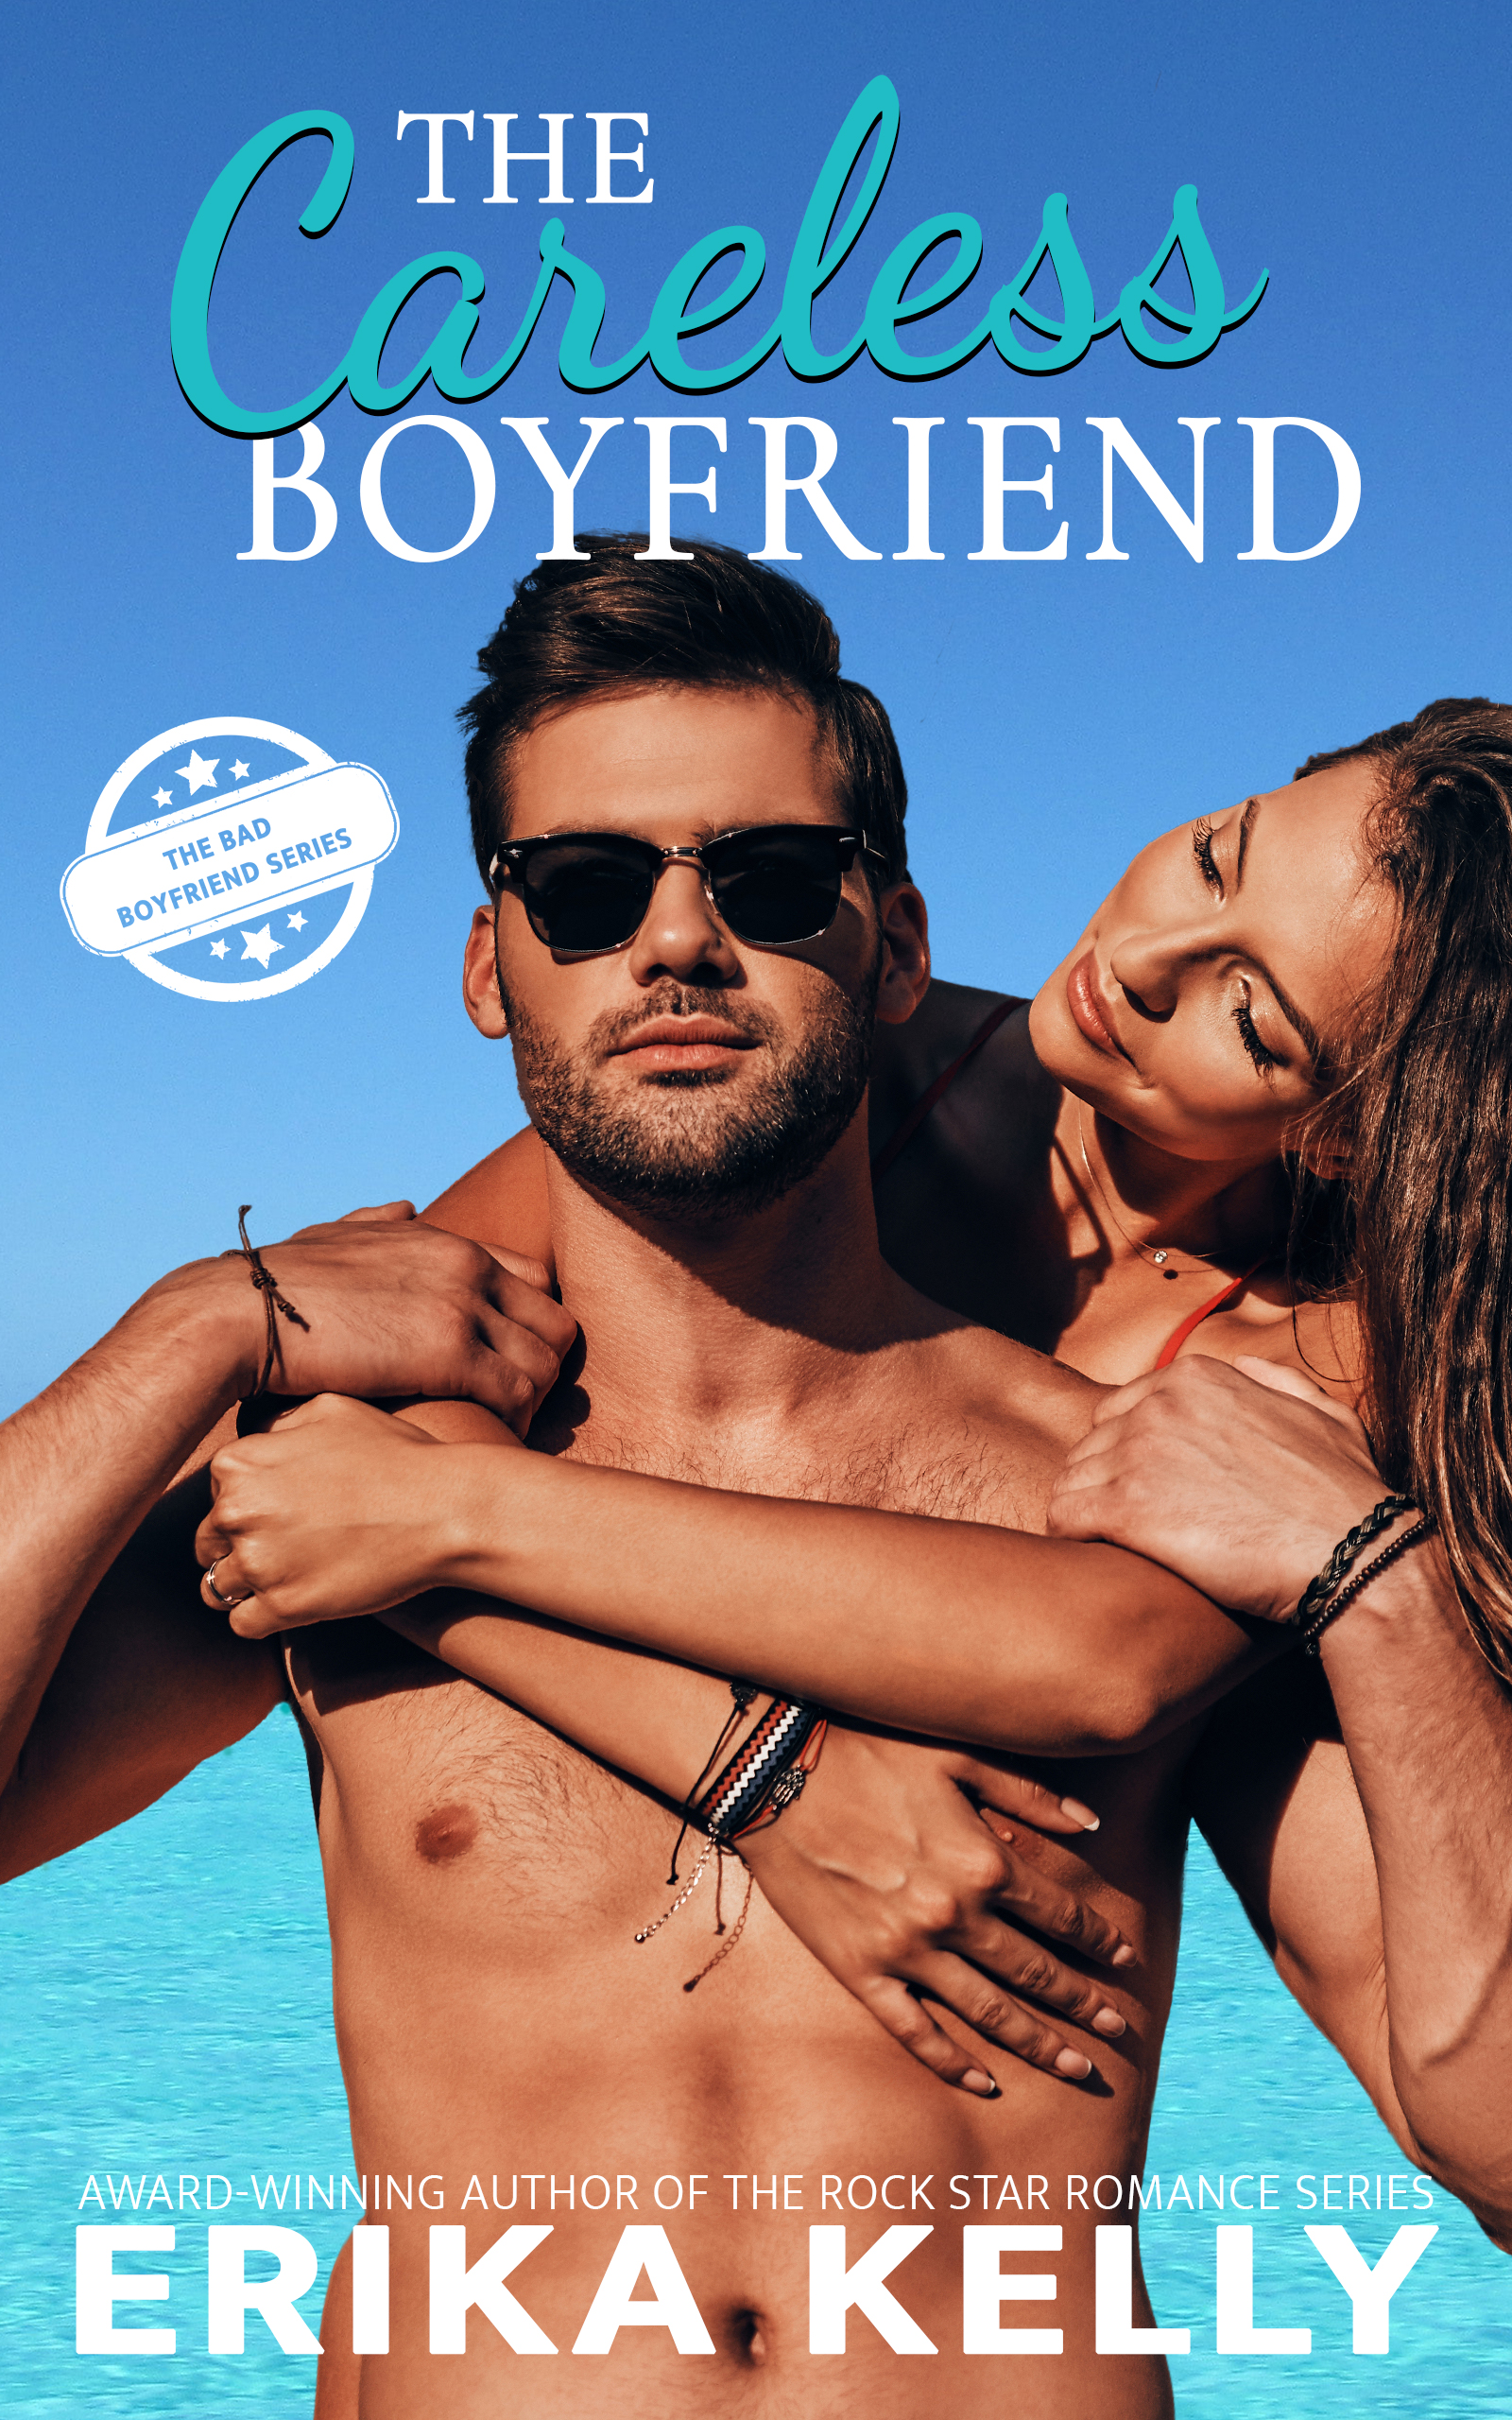 The Careless Boyfriend new cover